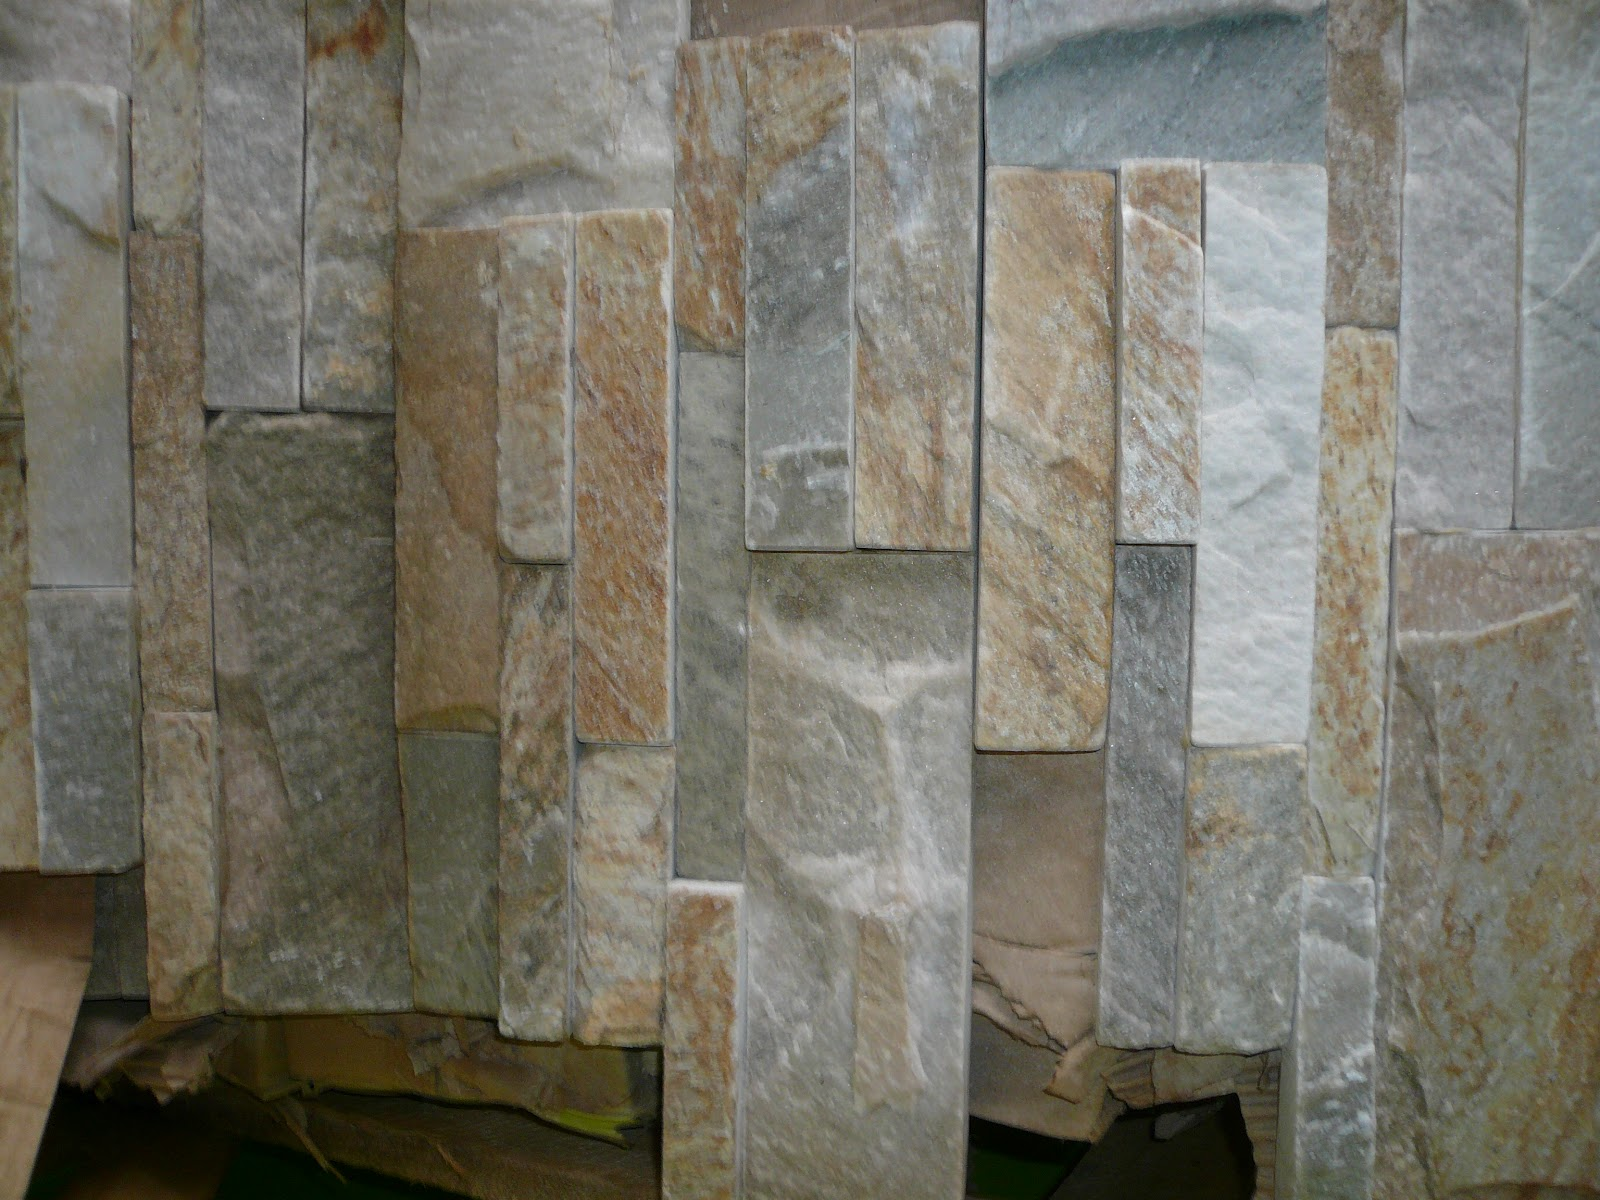 Rowlands piedra natural muros y pavimentos oferta en - Pavimentos piedra natural ...